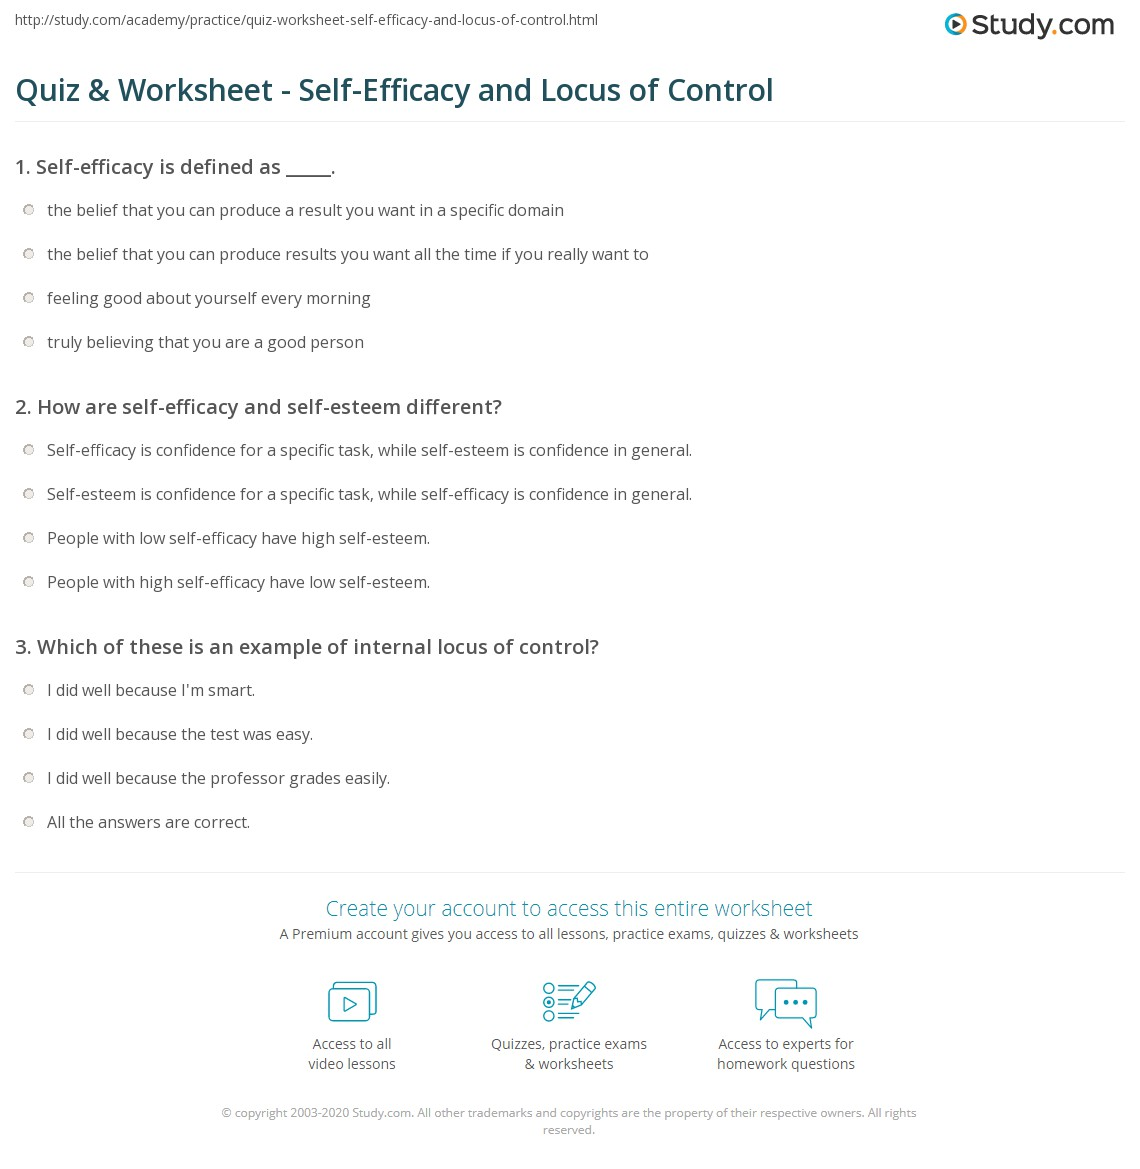 Quiz & Worksheet - Self-Efficacy and Locus of Control | Study.com